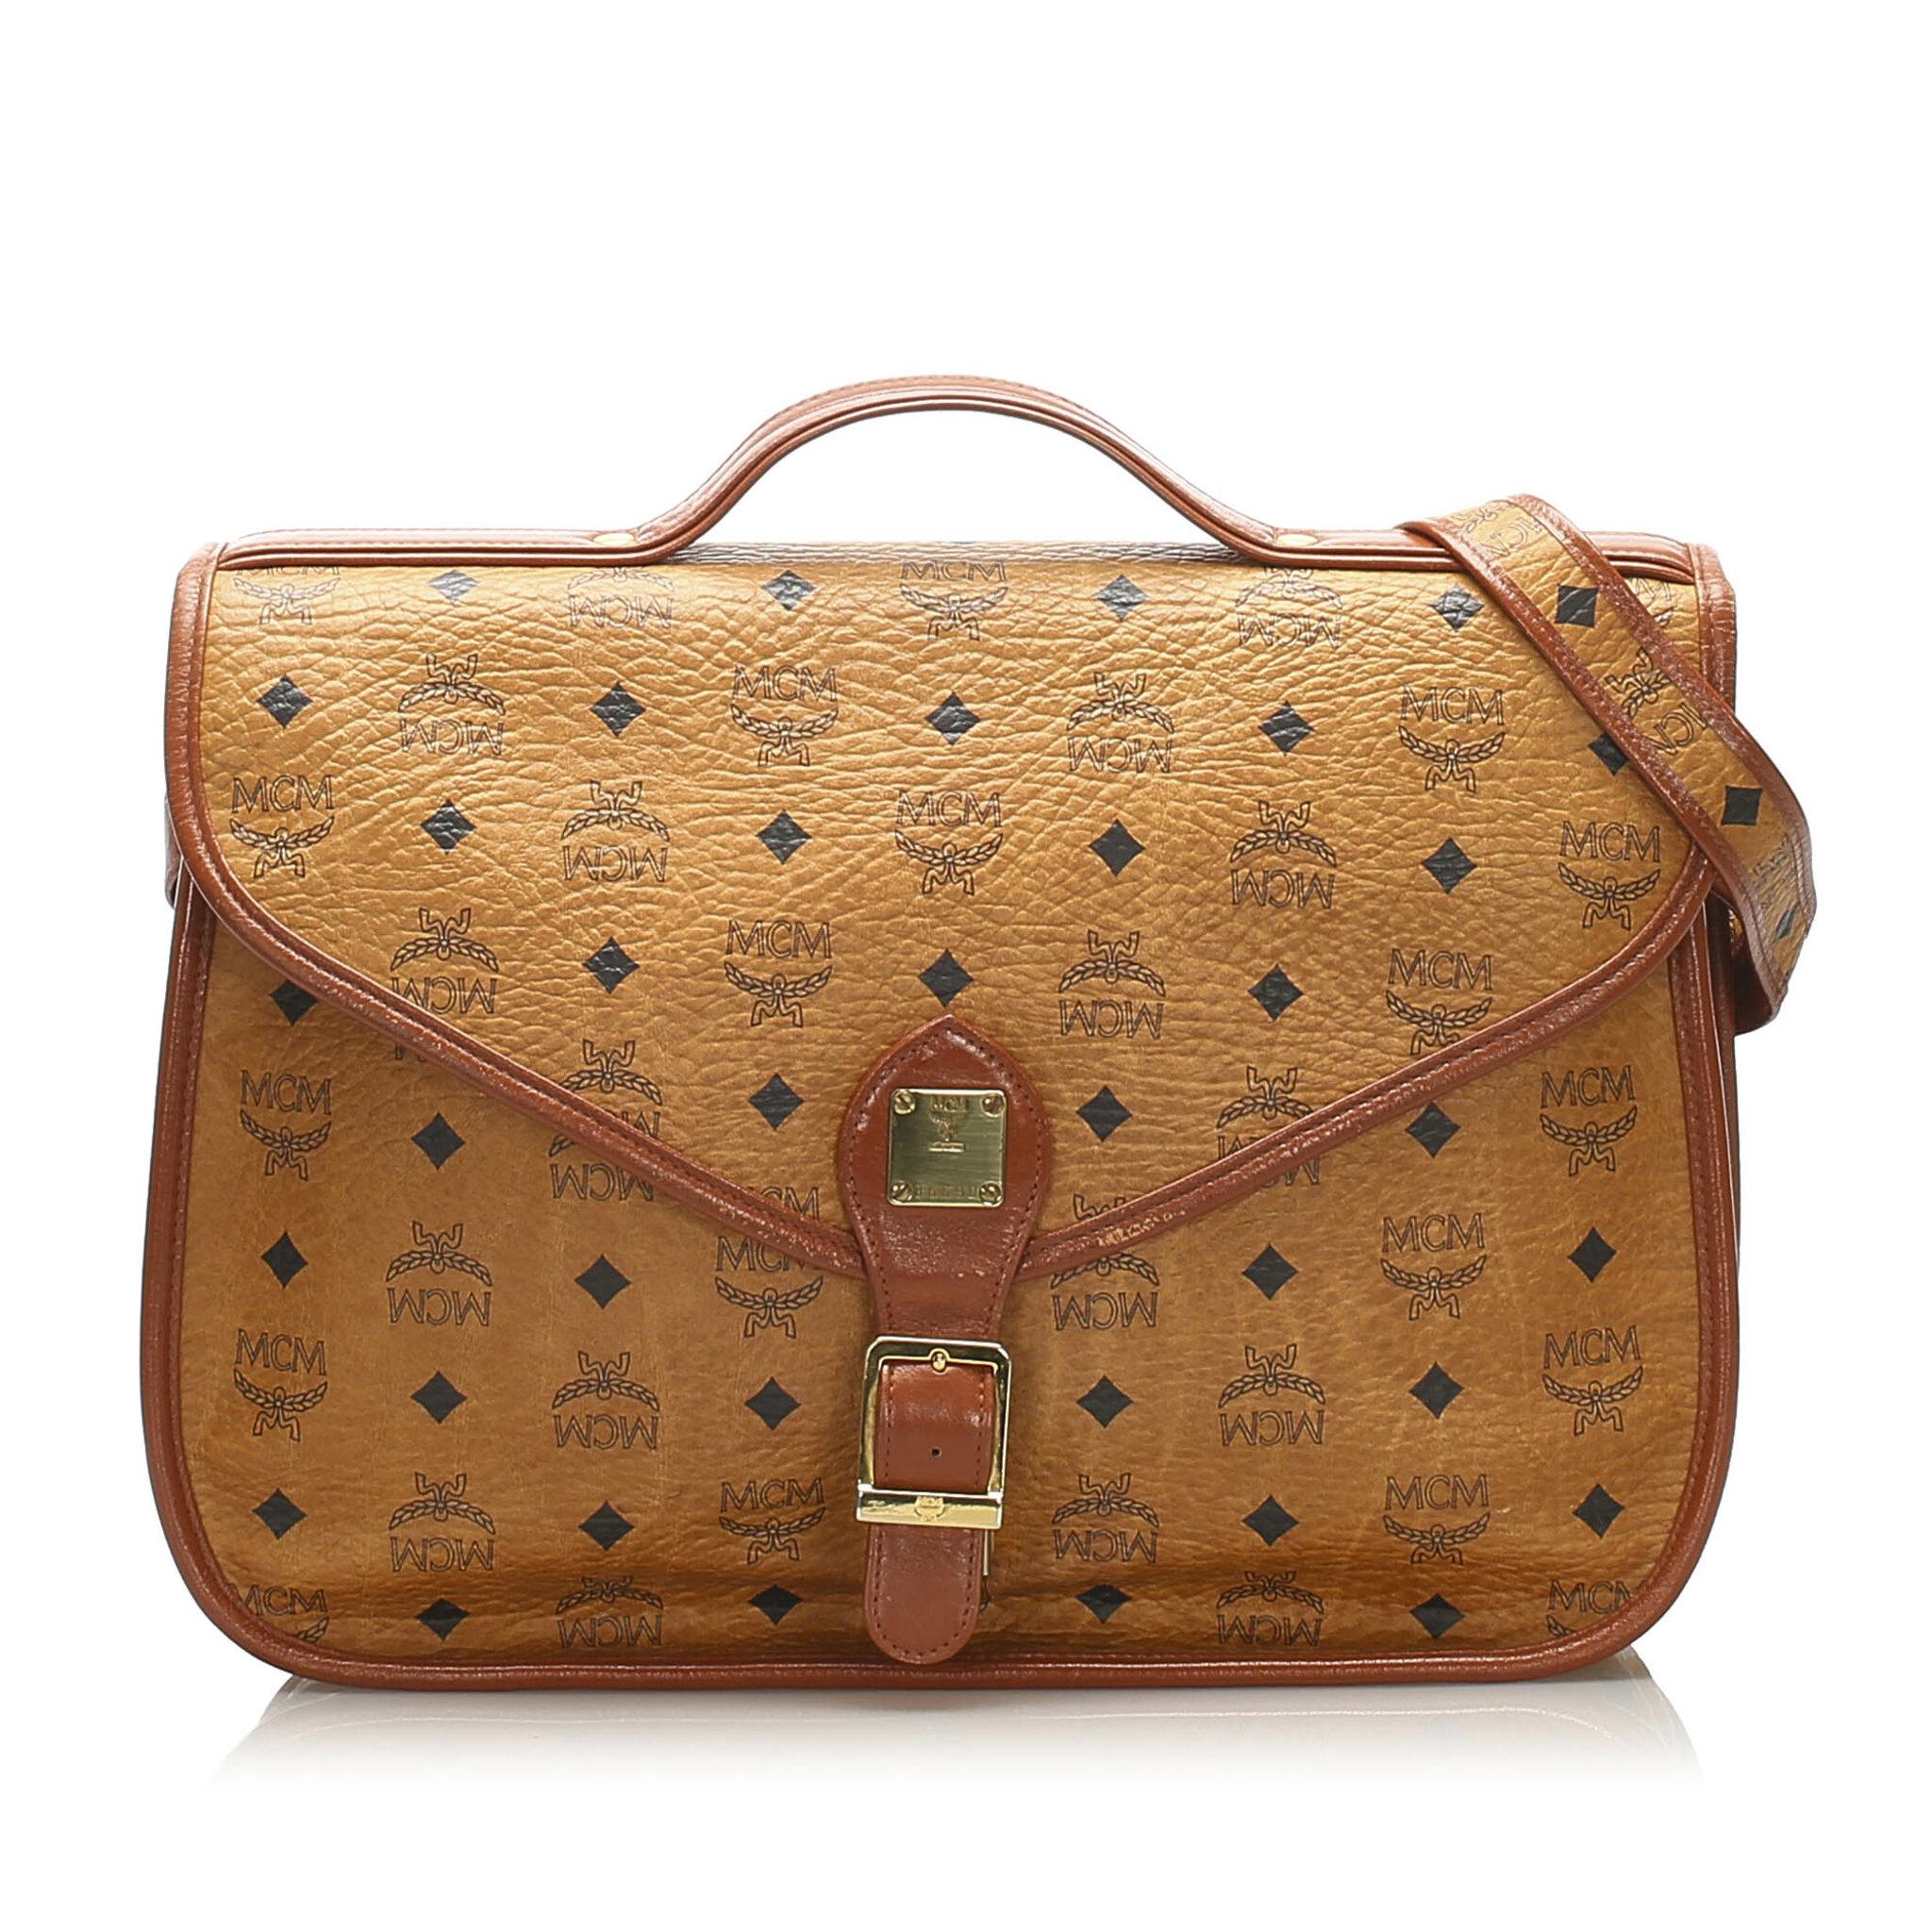 Mcm Visetos Leather Satchel